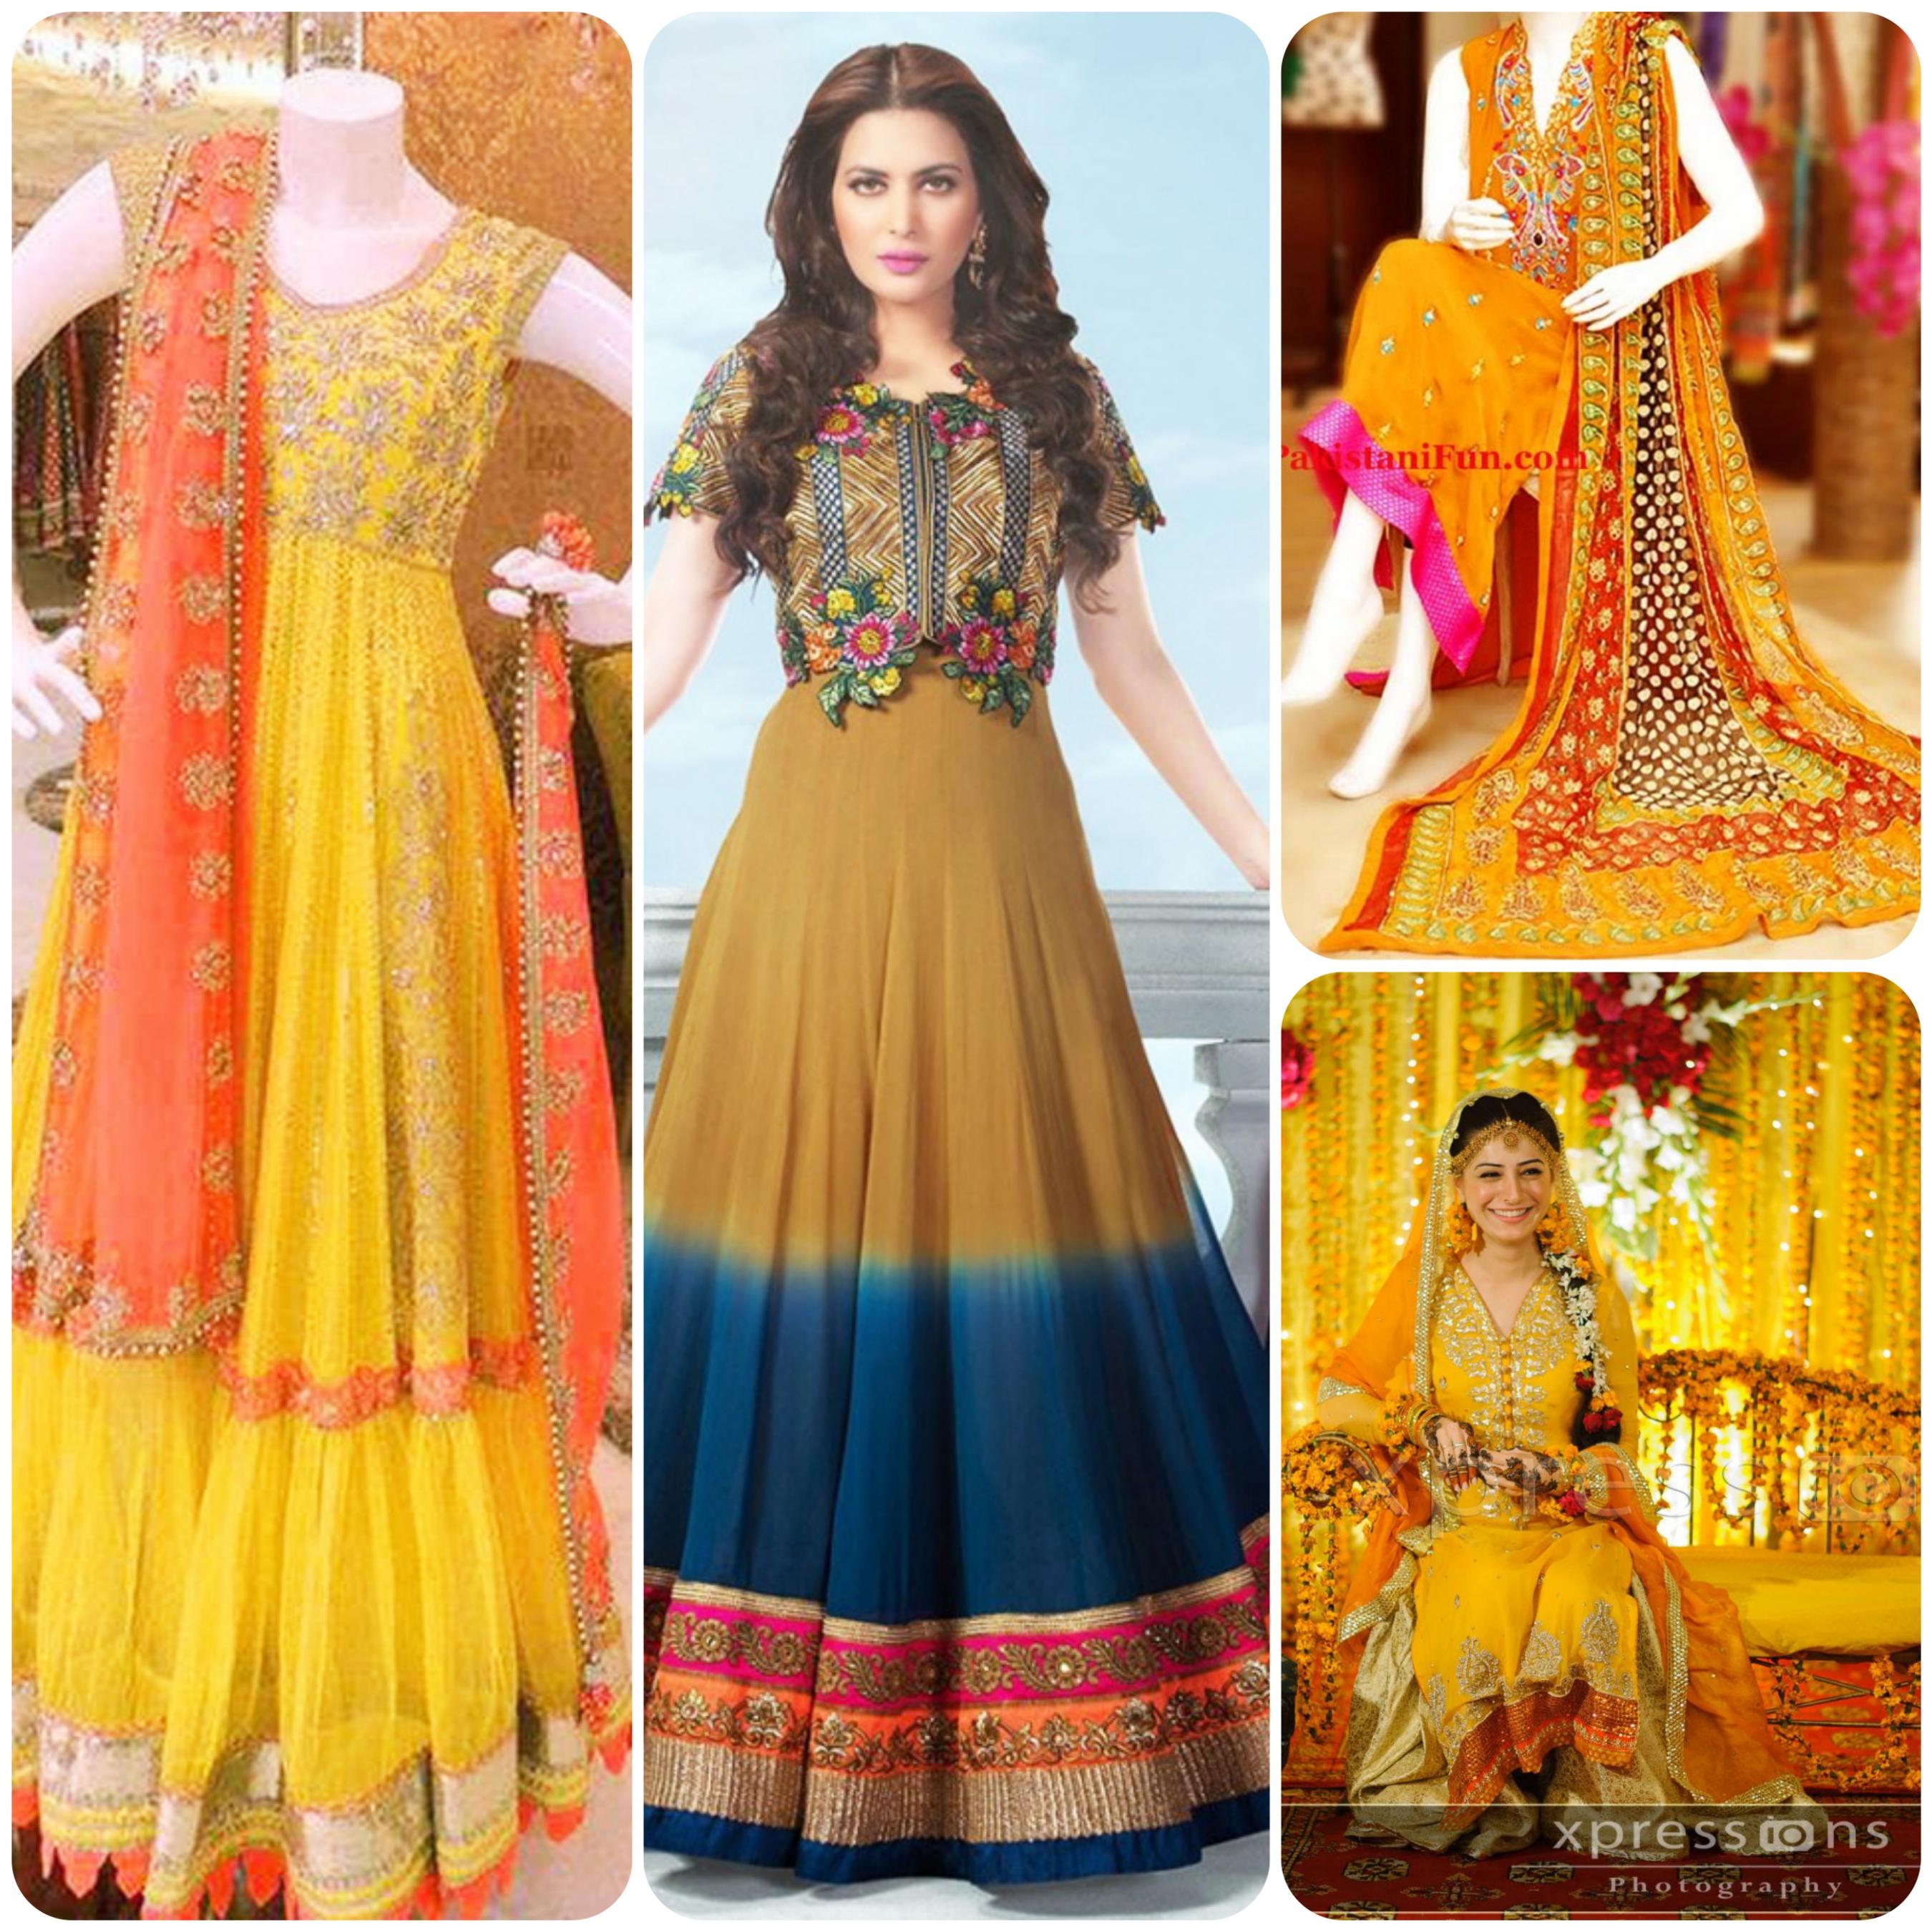 d7151a683e latest bridal mehndi dresses 14 styloplanet .com | Stylo Planet